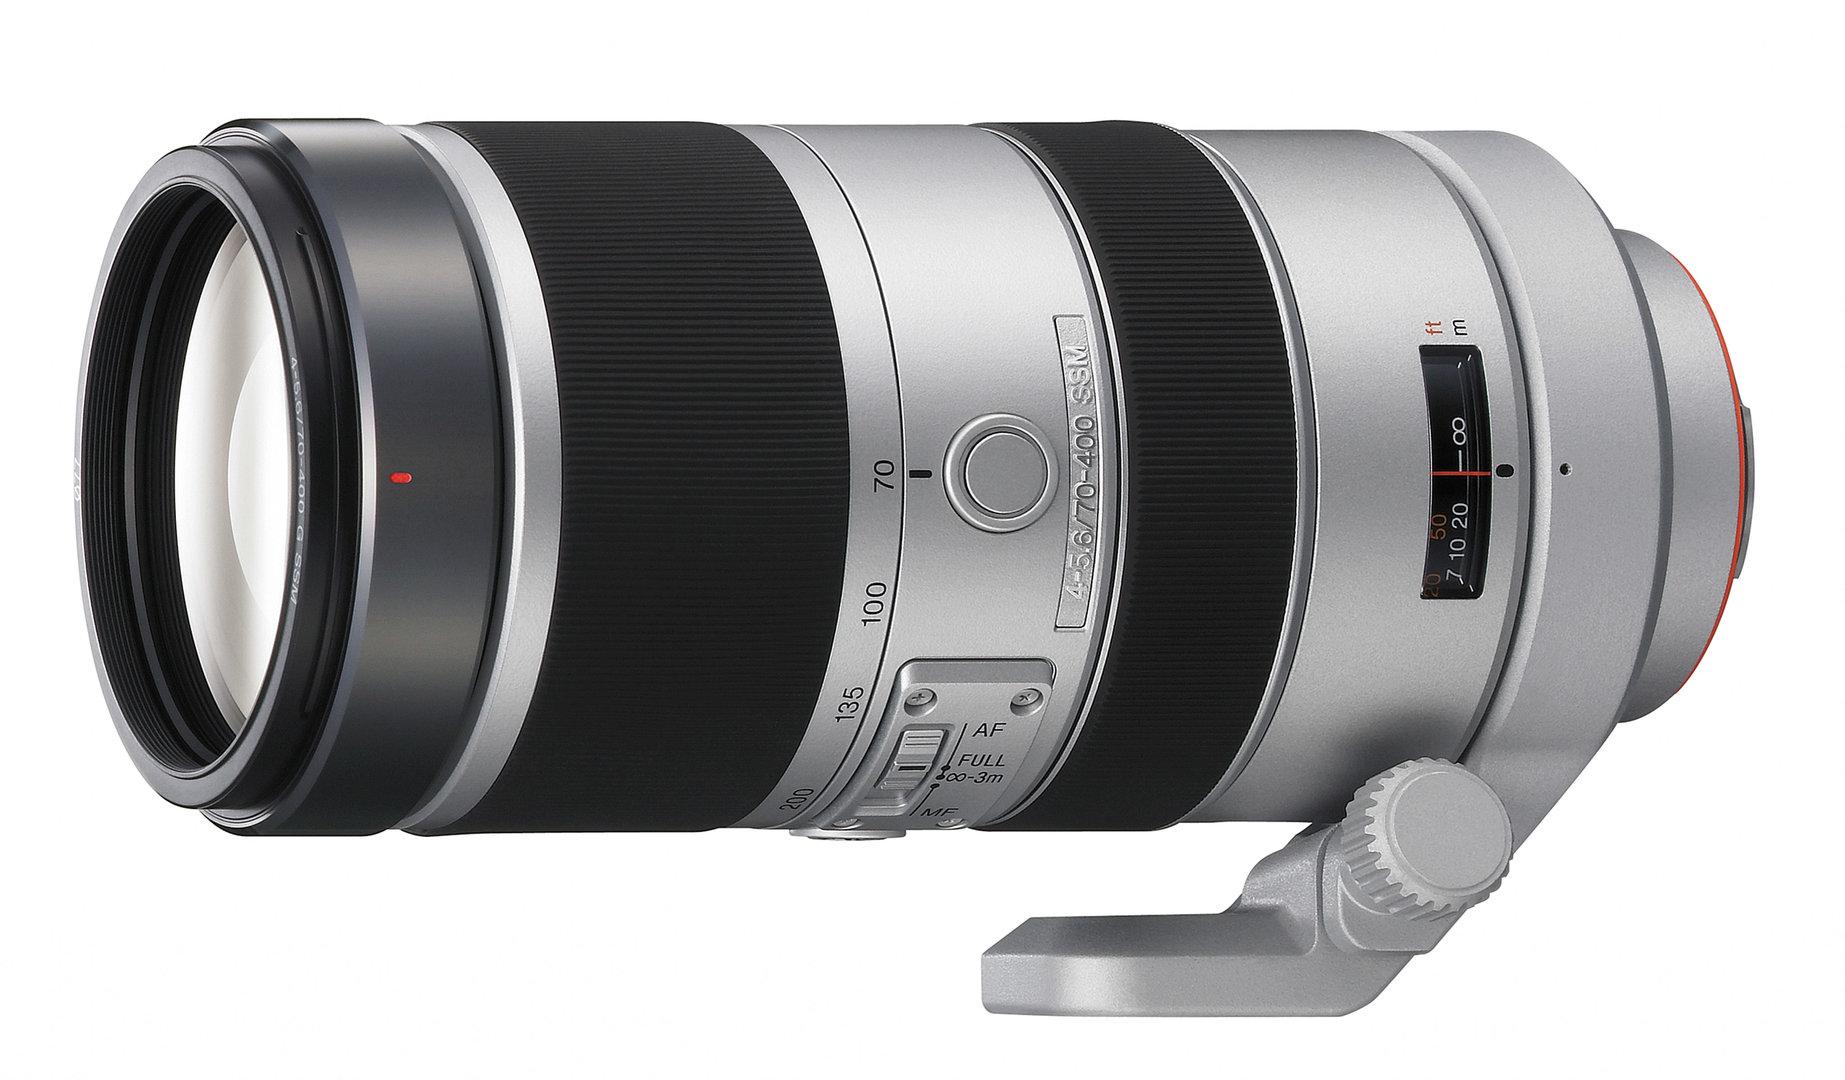 Sony 70-400 mm F4-5,6 G SSM (SAL70400G)